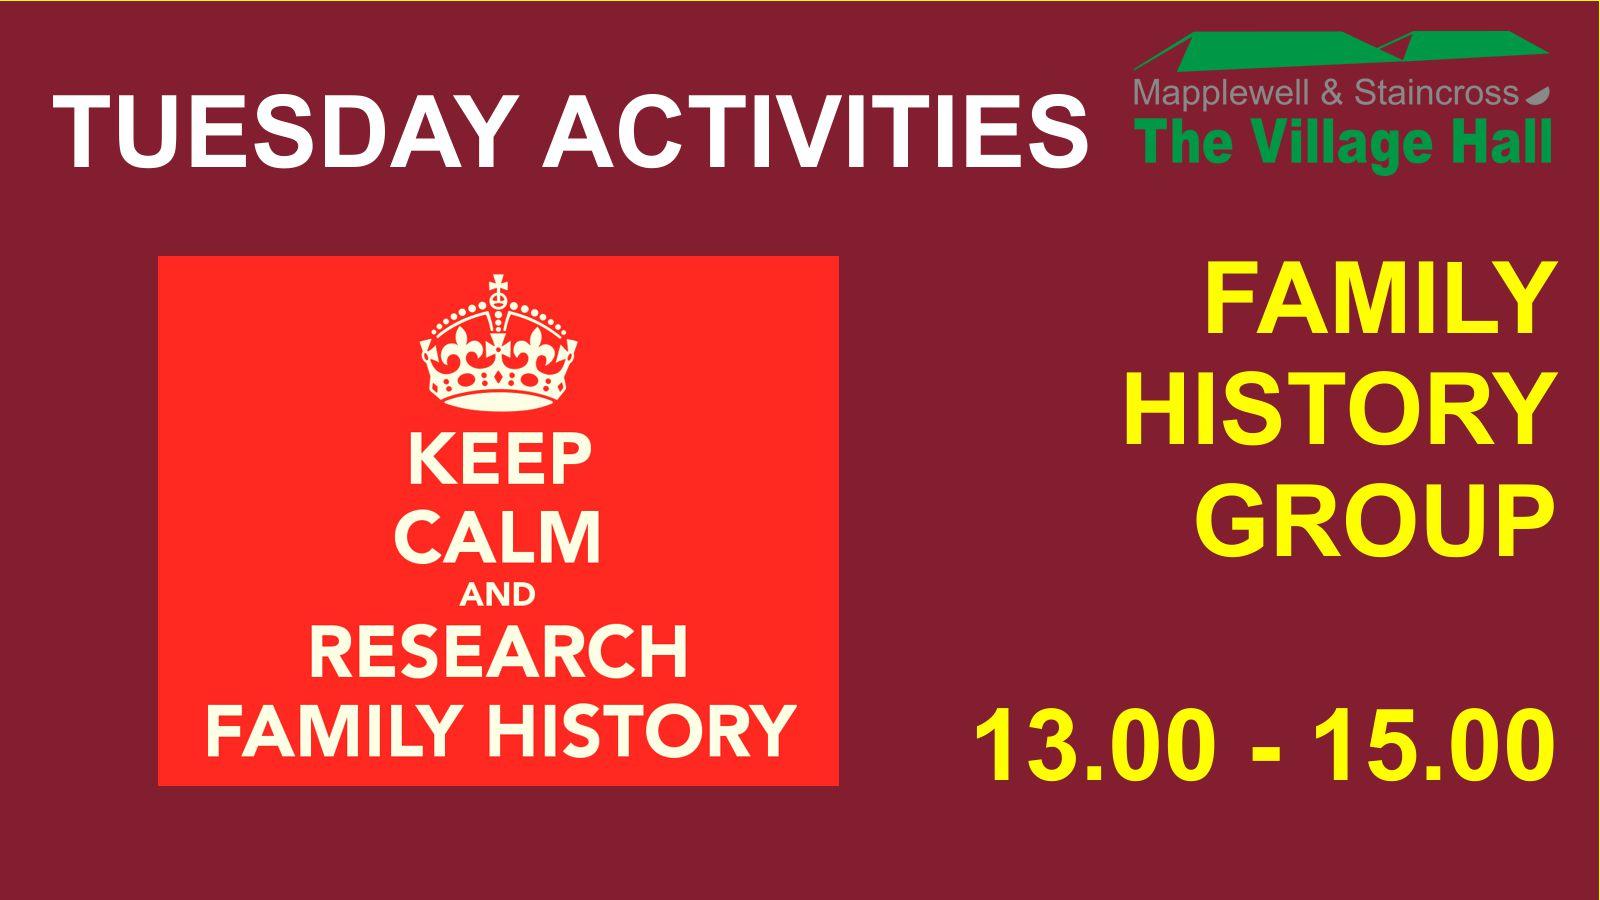 (C) Nick Hibberd - Family History Group